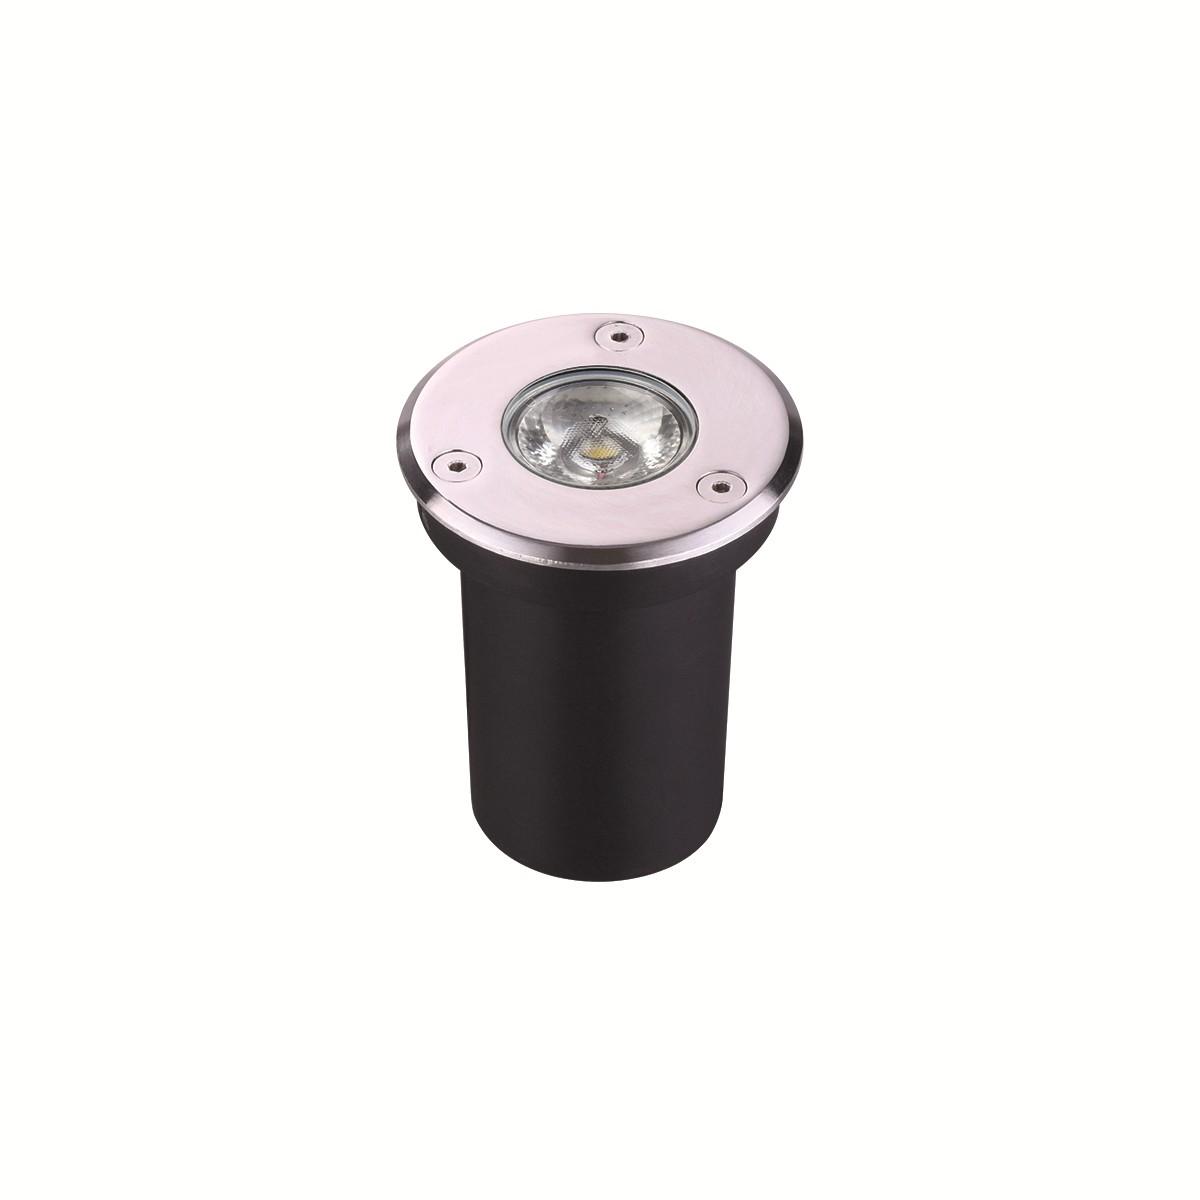 Luminaria de Embutir Balizador LED 6W Luz Branca Bivolt - Luminatti